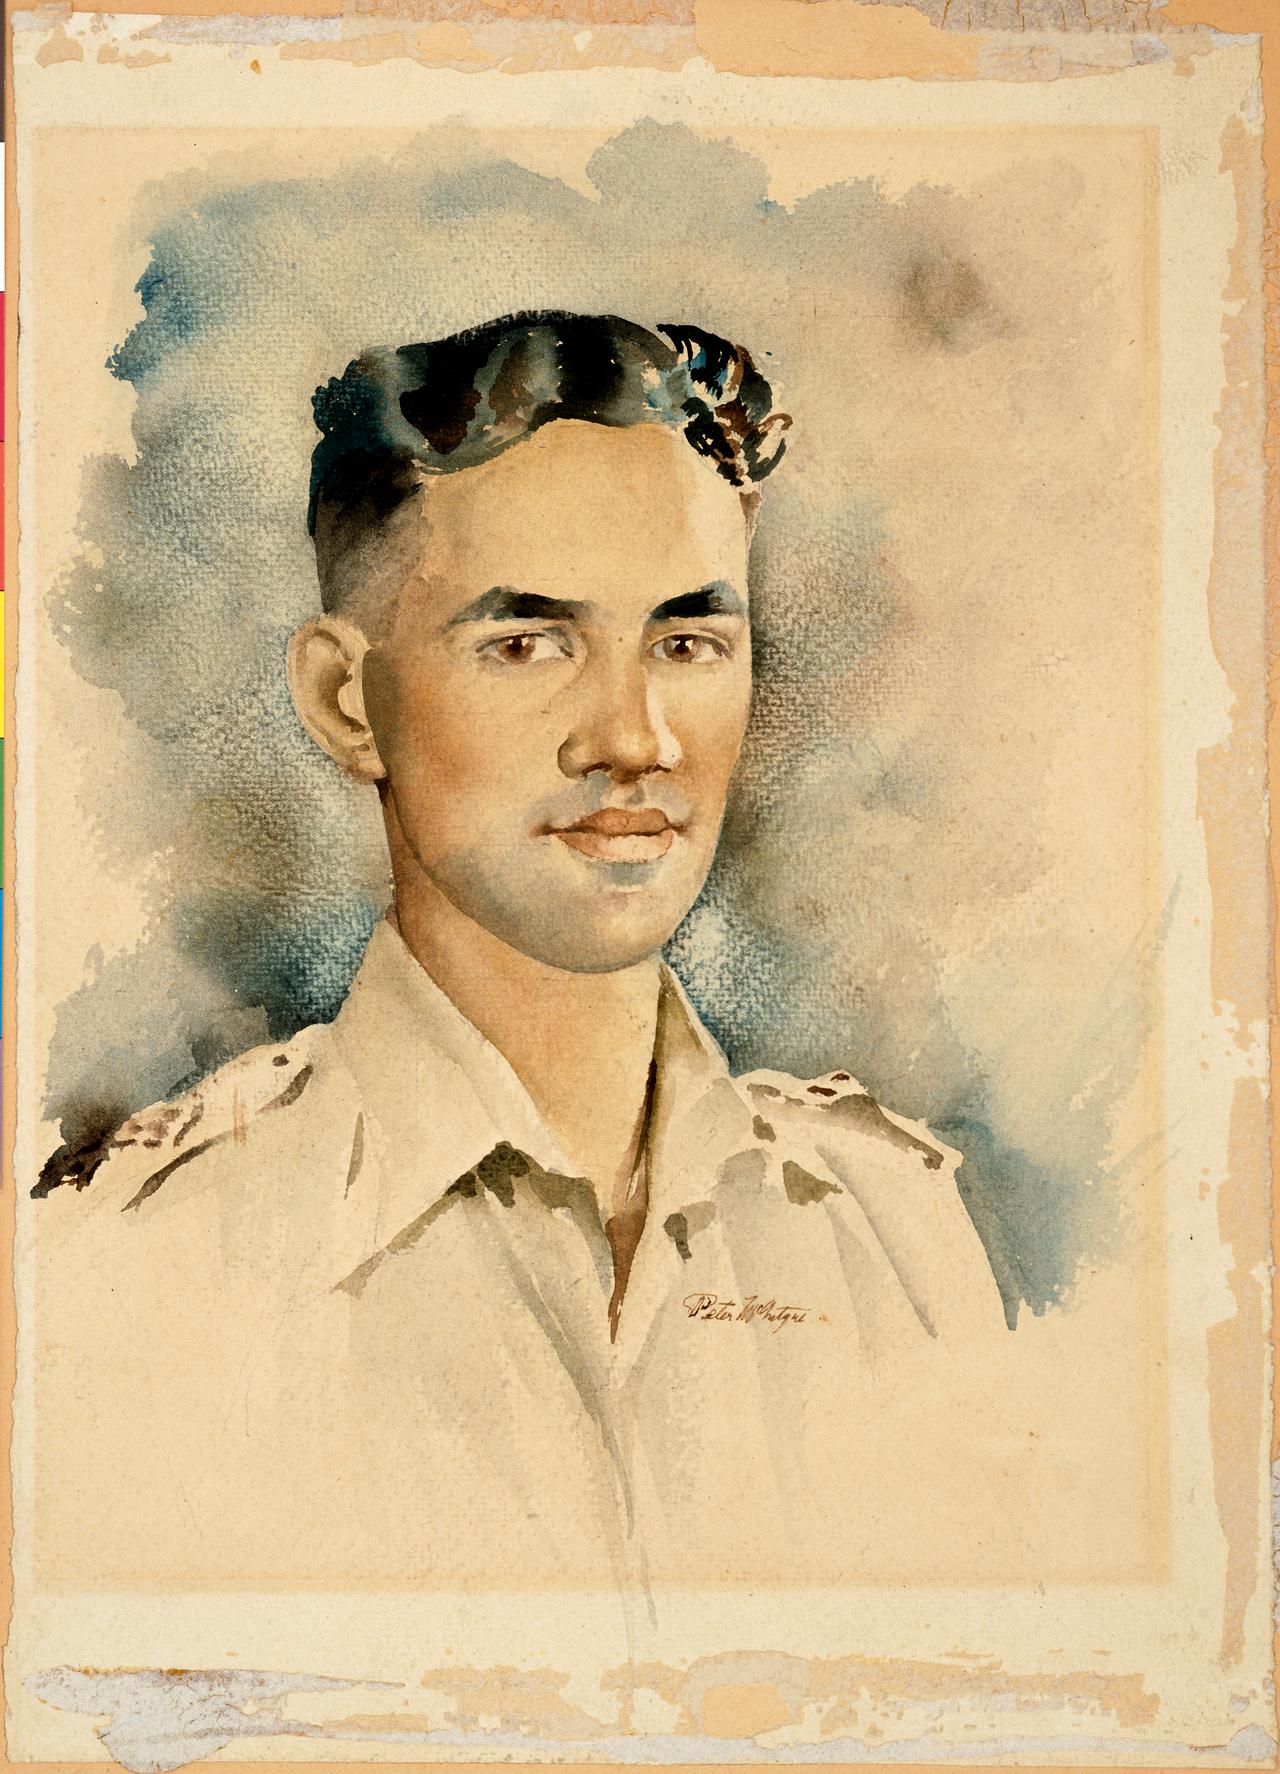 Figure 4: Watercolour portrait of 2nd Lieutenant Moananui-a-Kiwa Ngārimu, VC, by Peter McIntyre, circa 1944. Source: Archives New Zealand,  War Art.  URL:      http://warart.archives.govt.nz/node/99